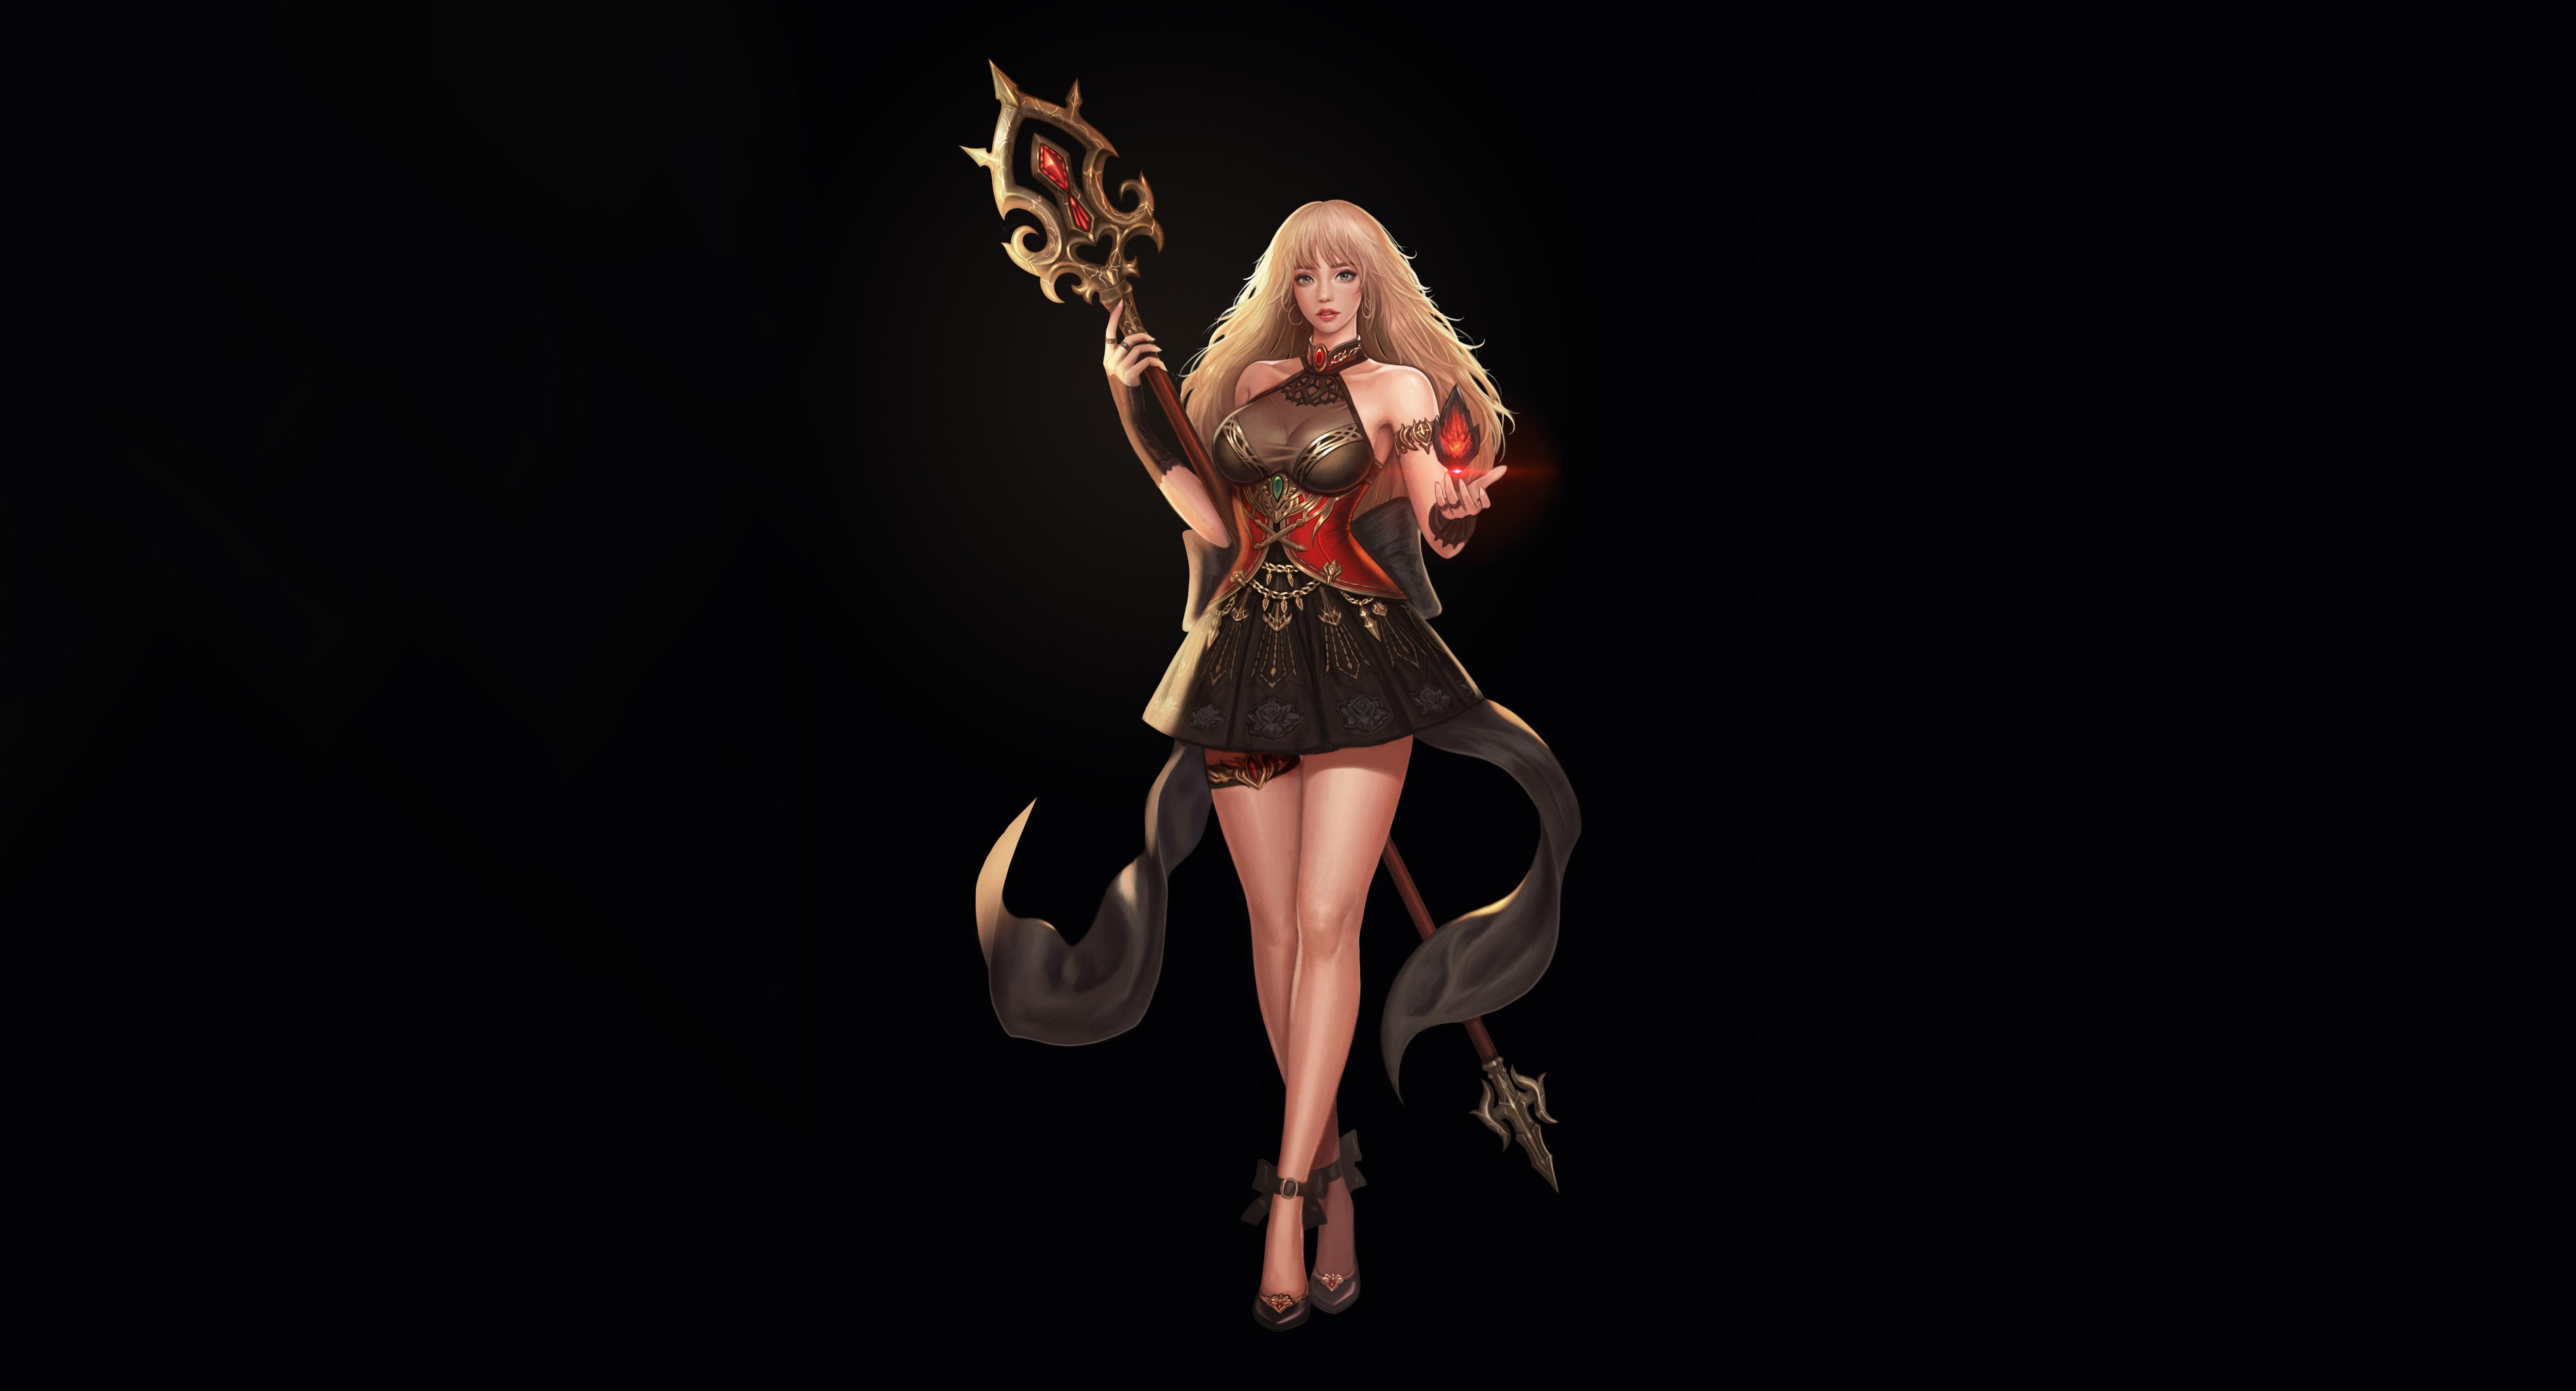 General 5000x2700 simple background blonde legs fantasy art fantasy girl